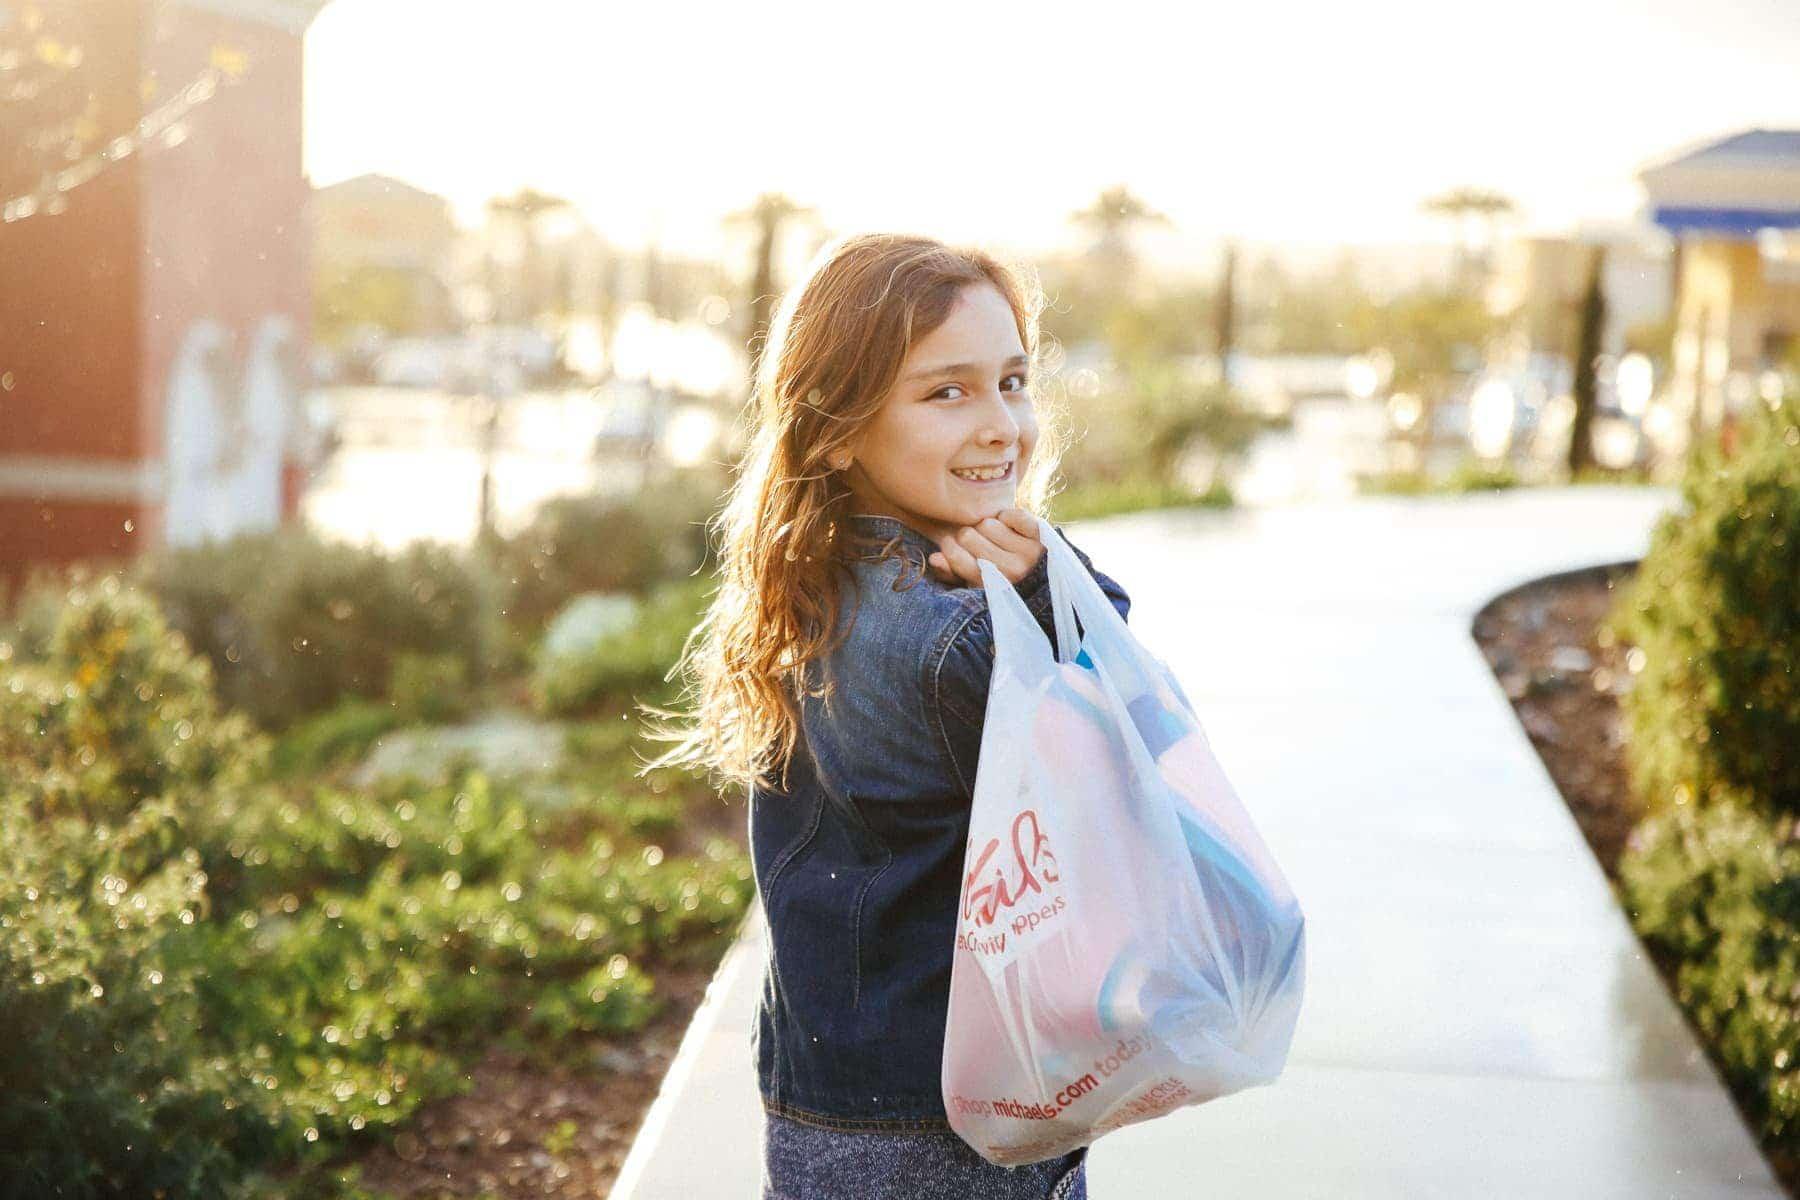 girl walking down sidewalk with bag